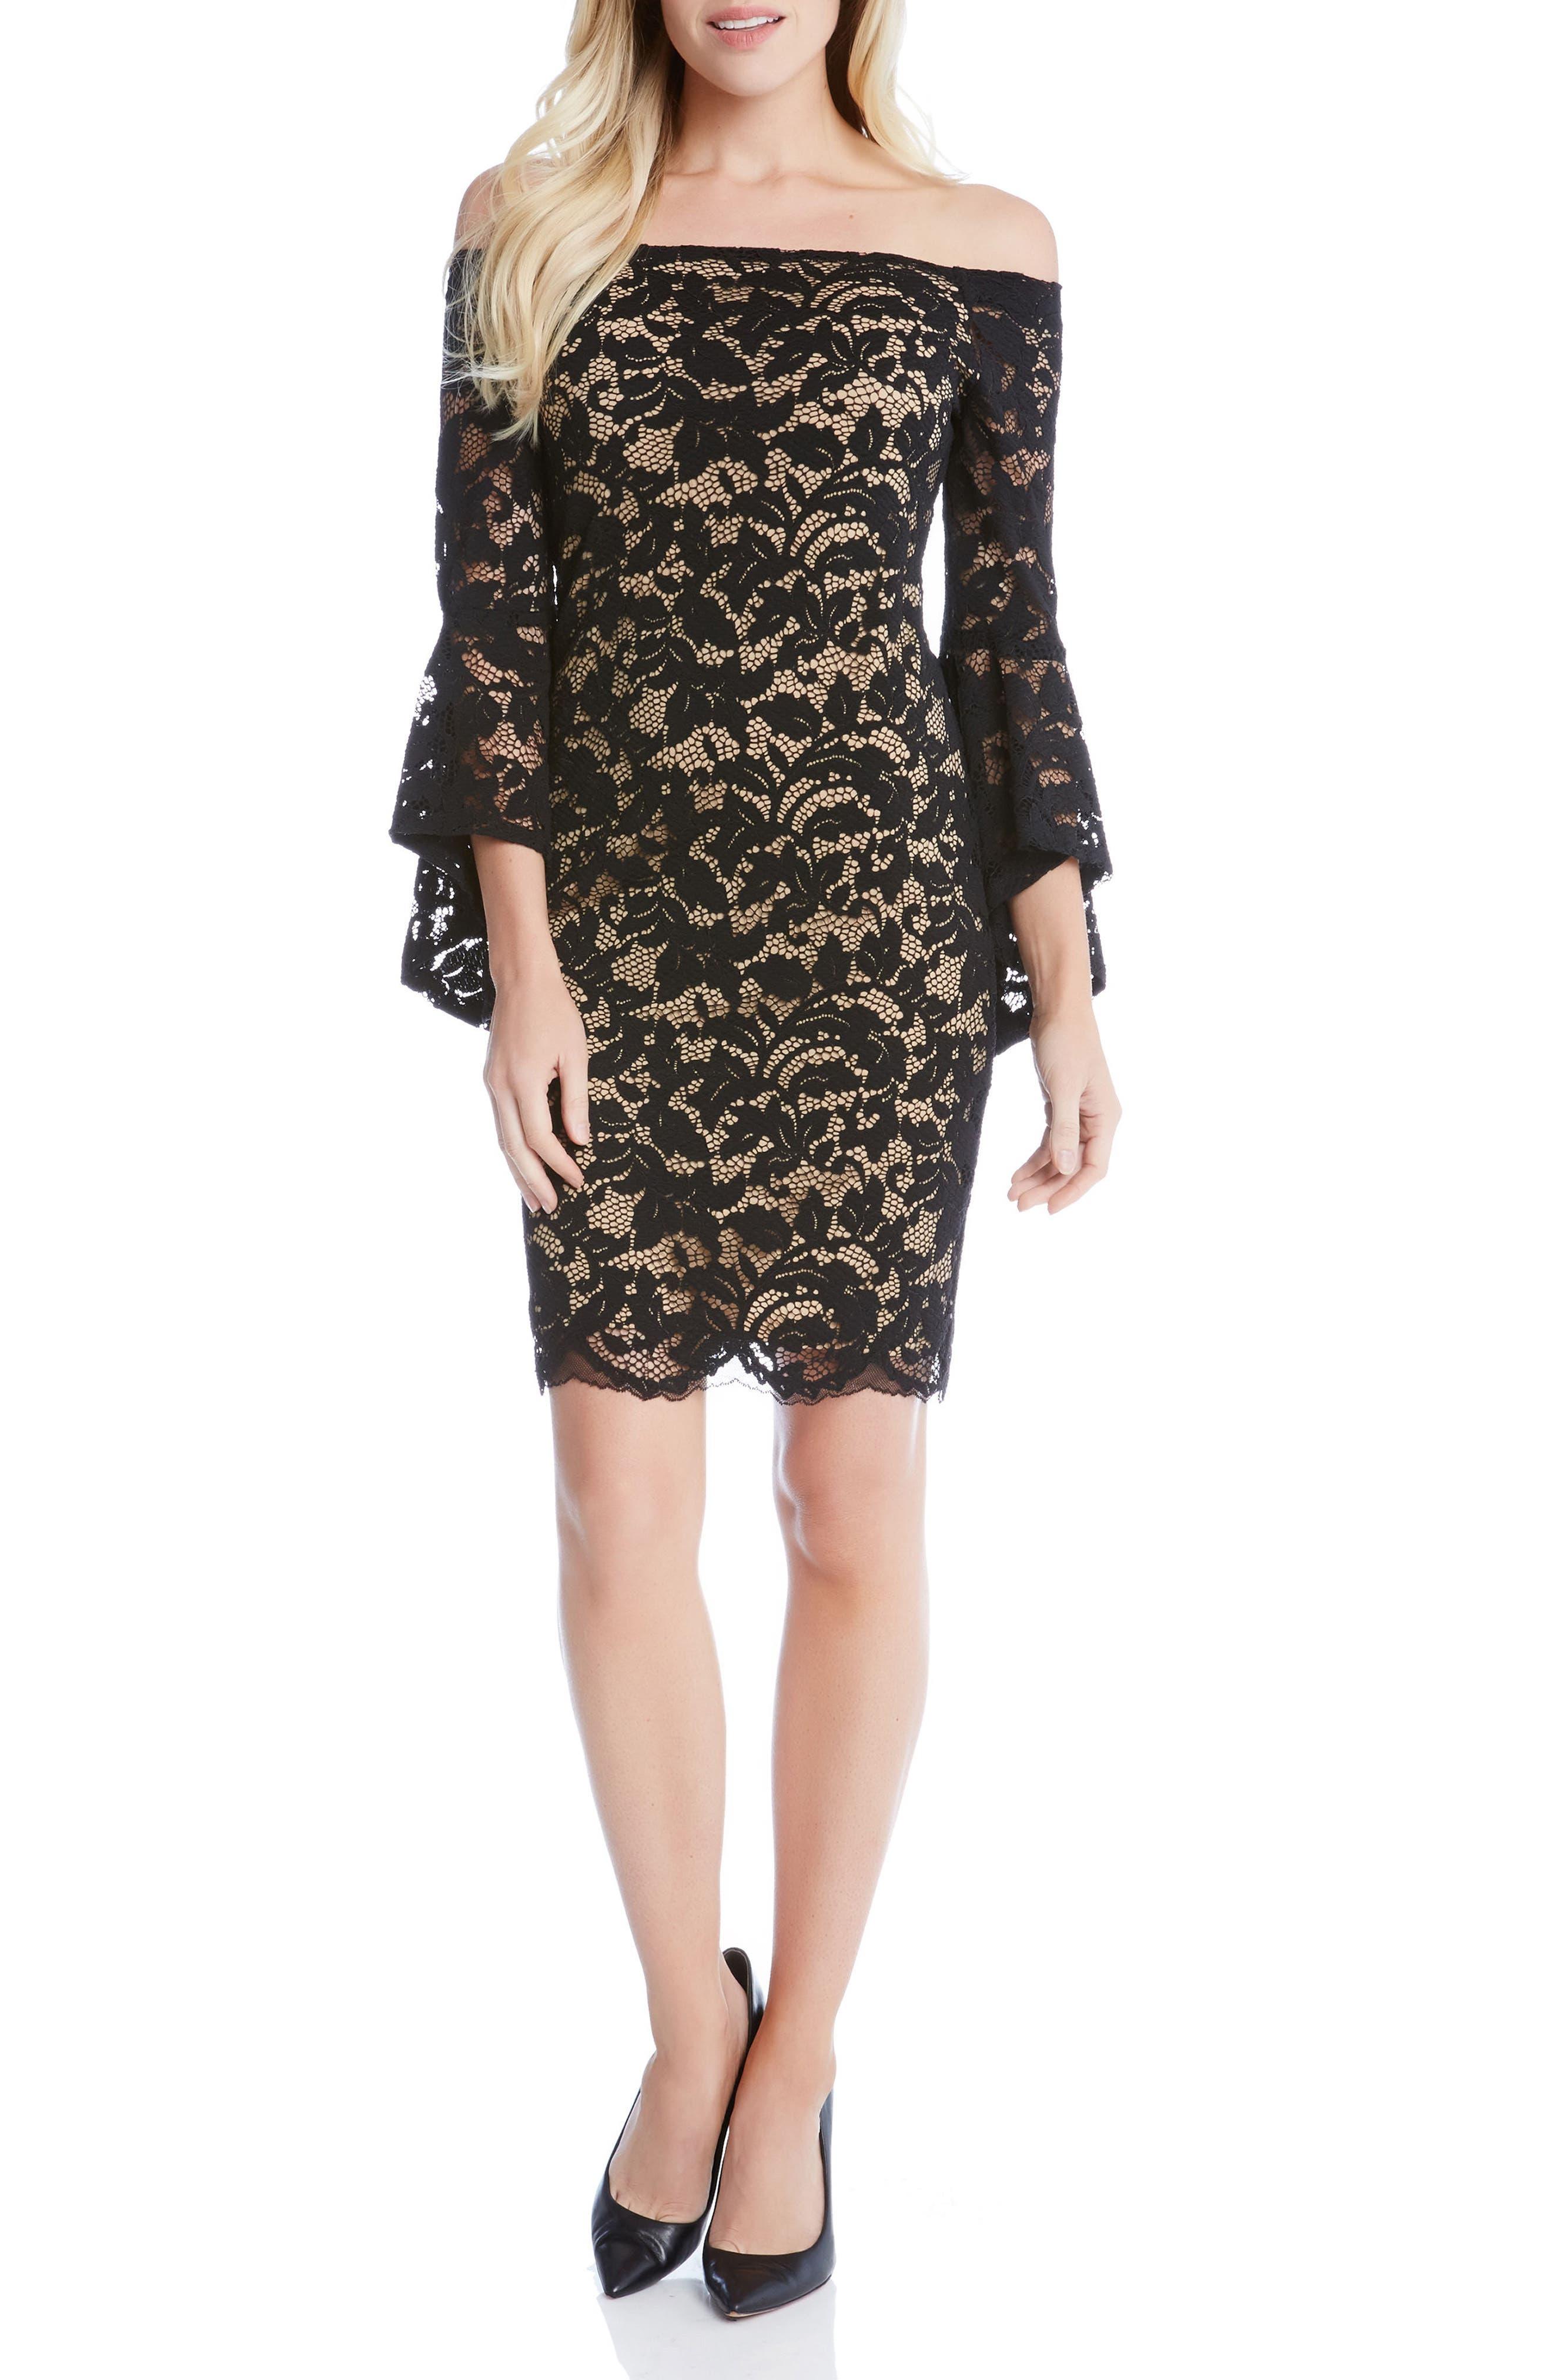 Samantha Lace Off the Shoulder Sheath Dress,                             Main thumbnail 1, color,                             BLACK/ NUDE